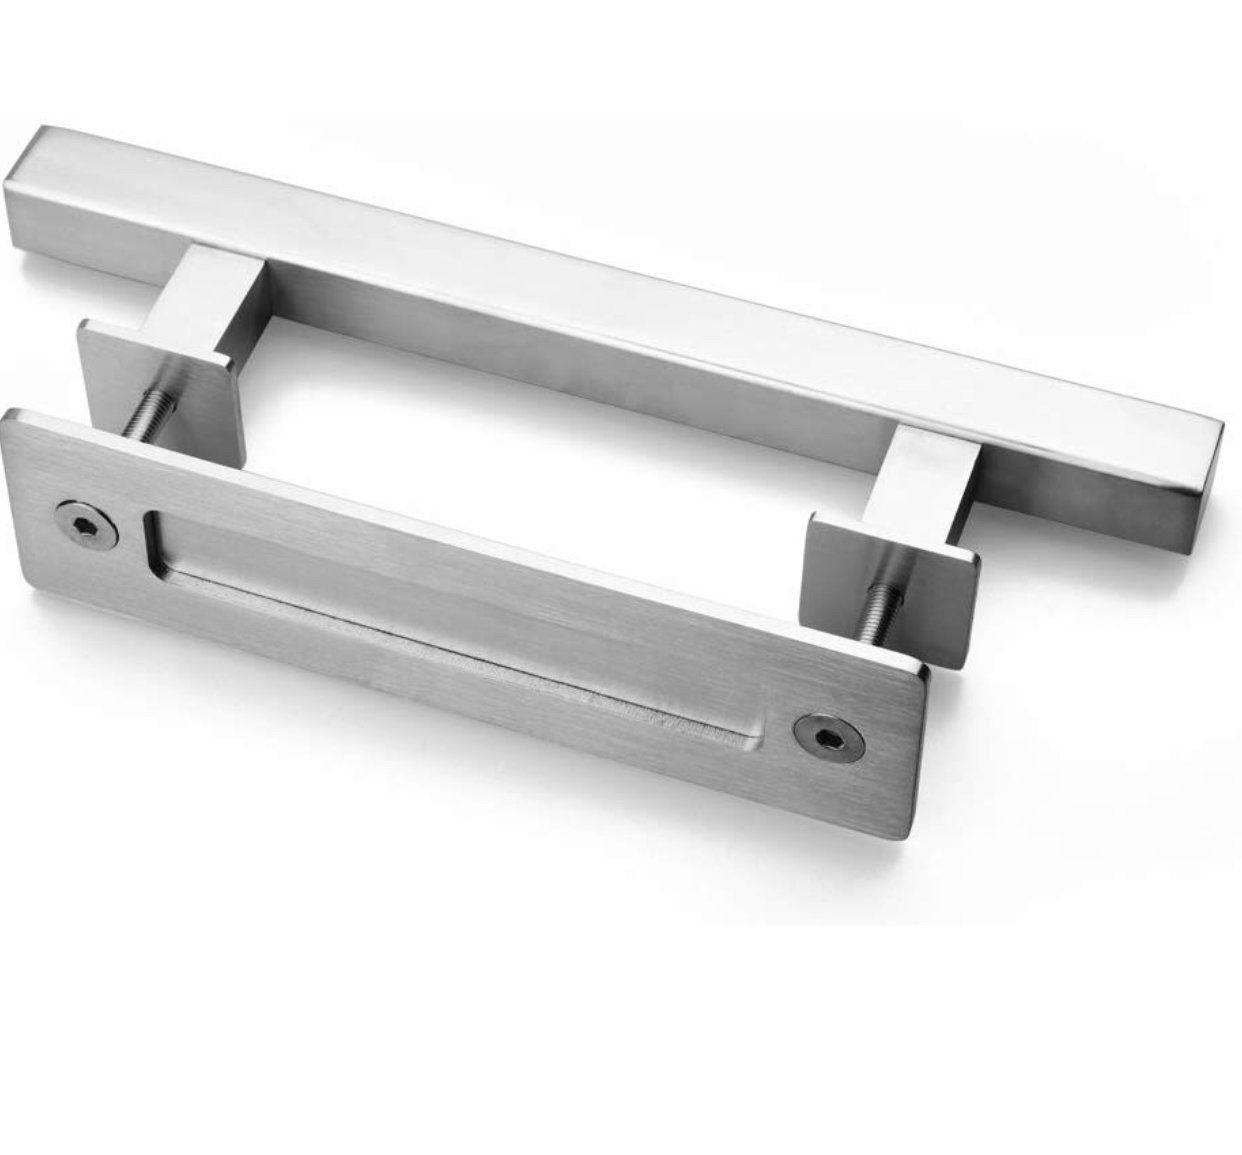 Brushed Chrome Door Handle In 2020 Brushed Chrome Door Handles Chrome Door Handles Interior Sliding Barn Doors